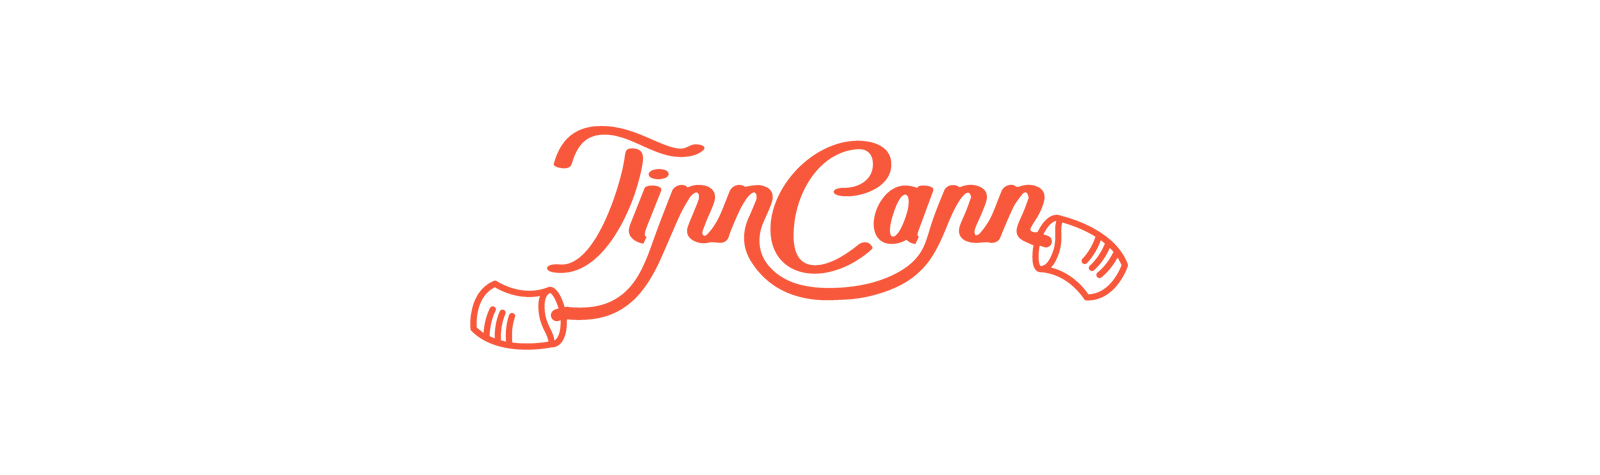 Tinn Cann Logo